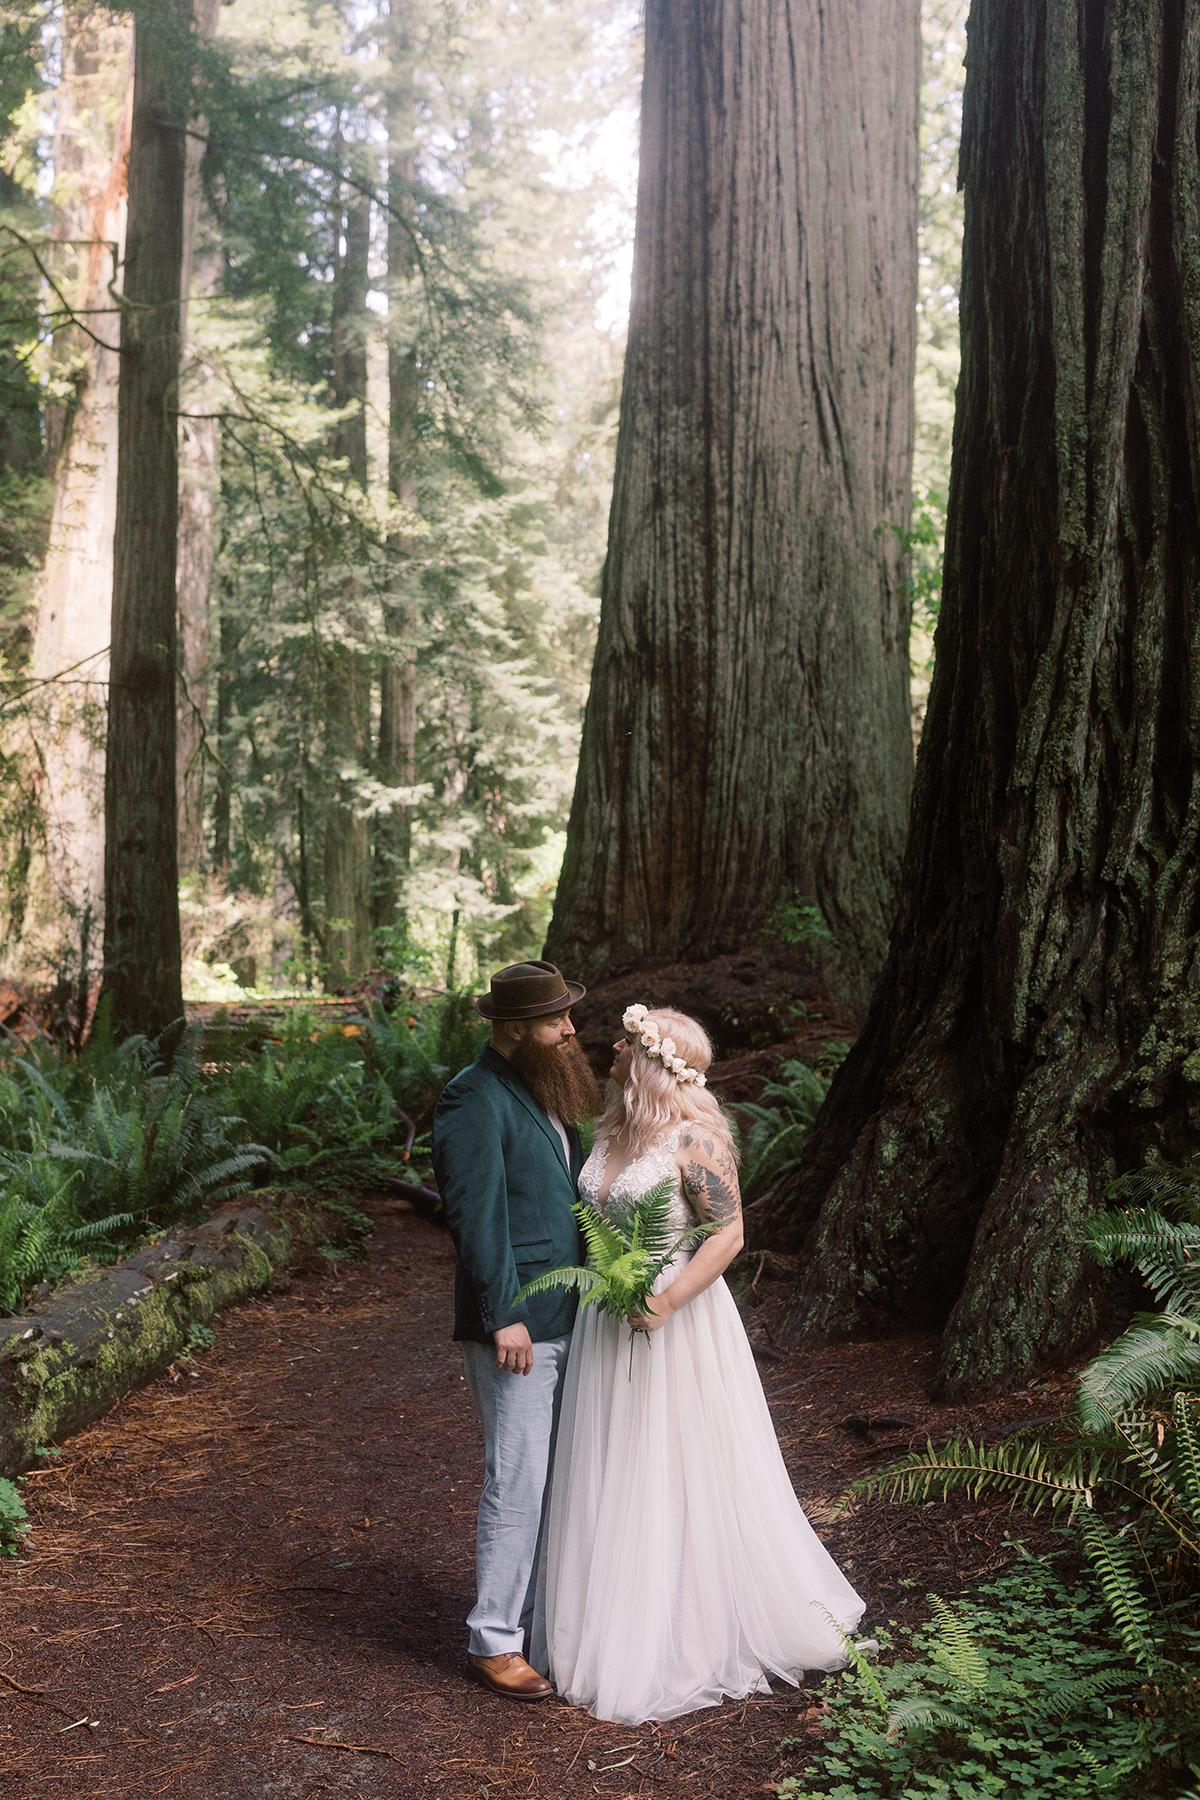 Prairie-Creek-Redwoods-State-Park-wedding-elopement-photos-05